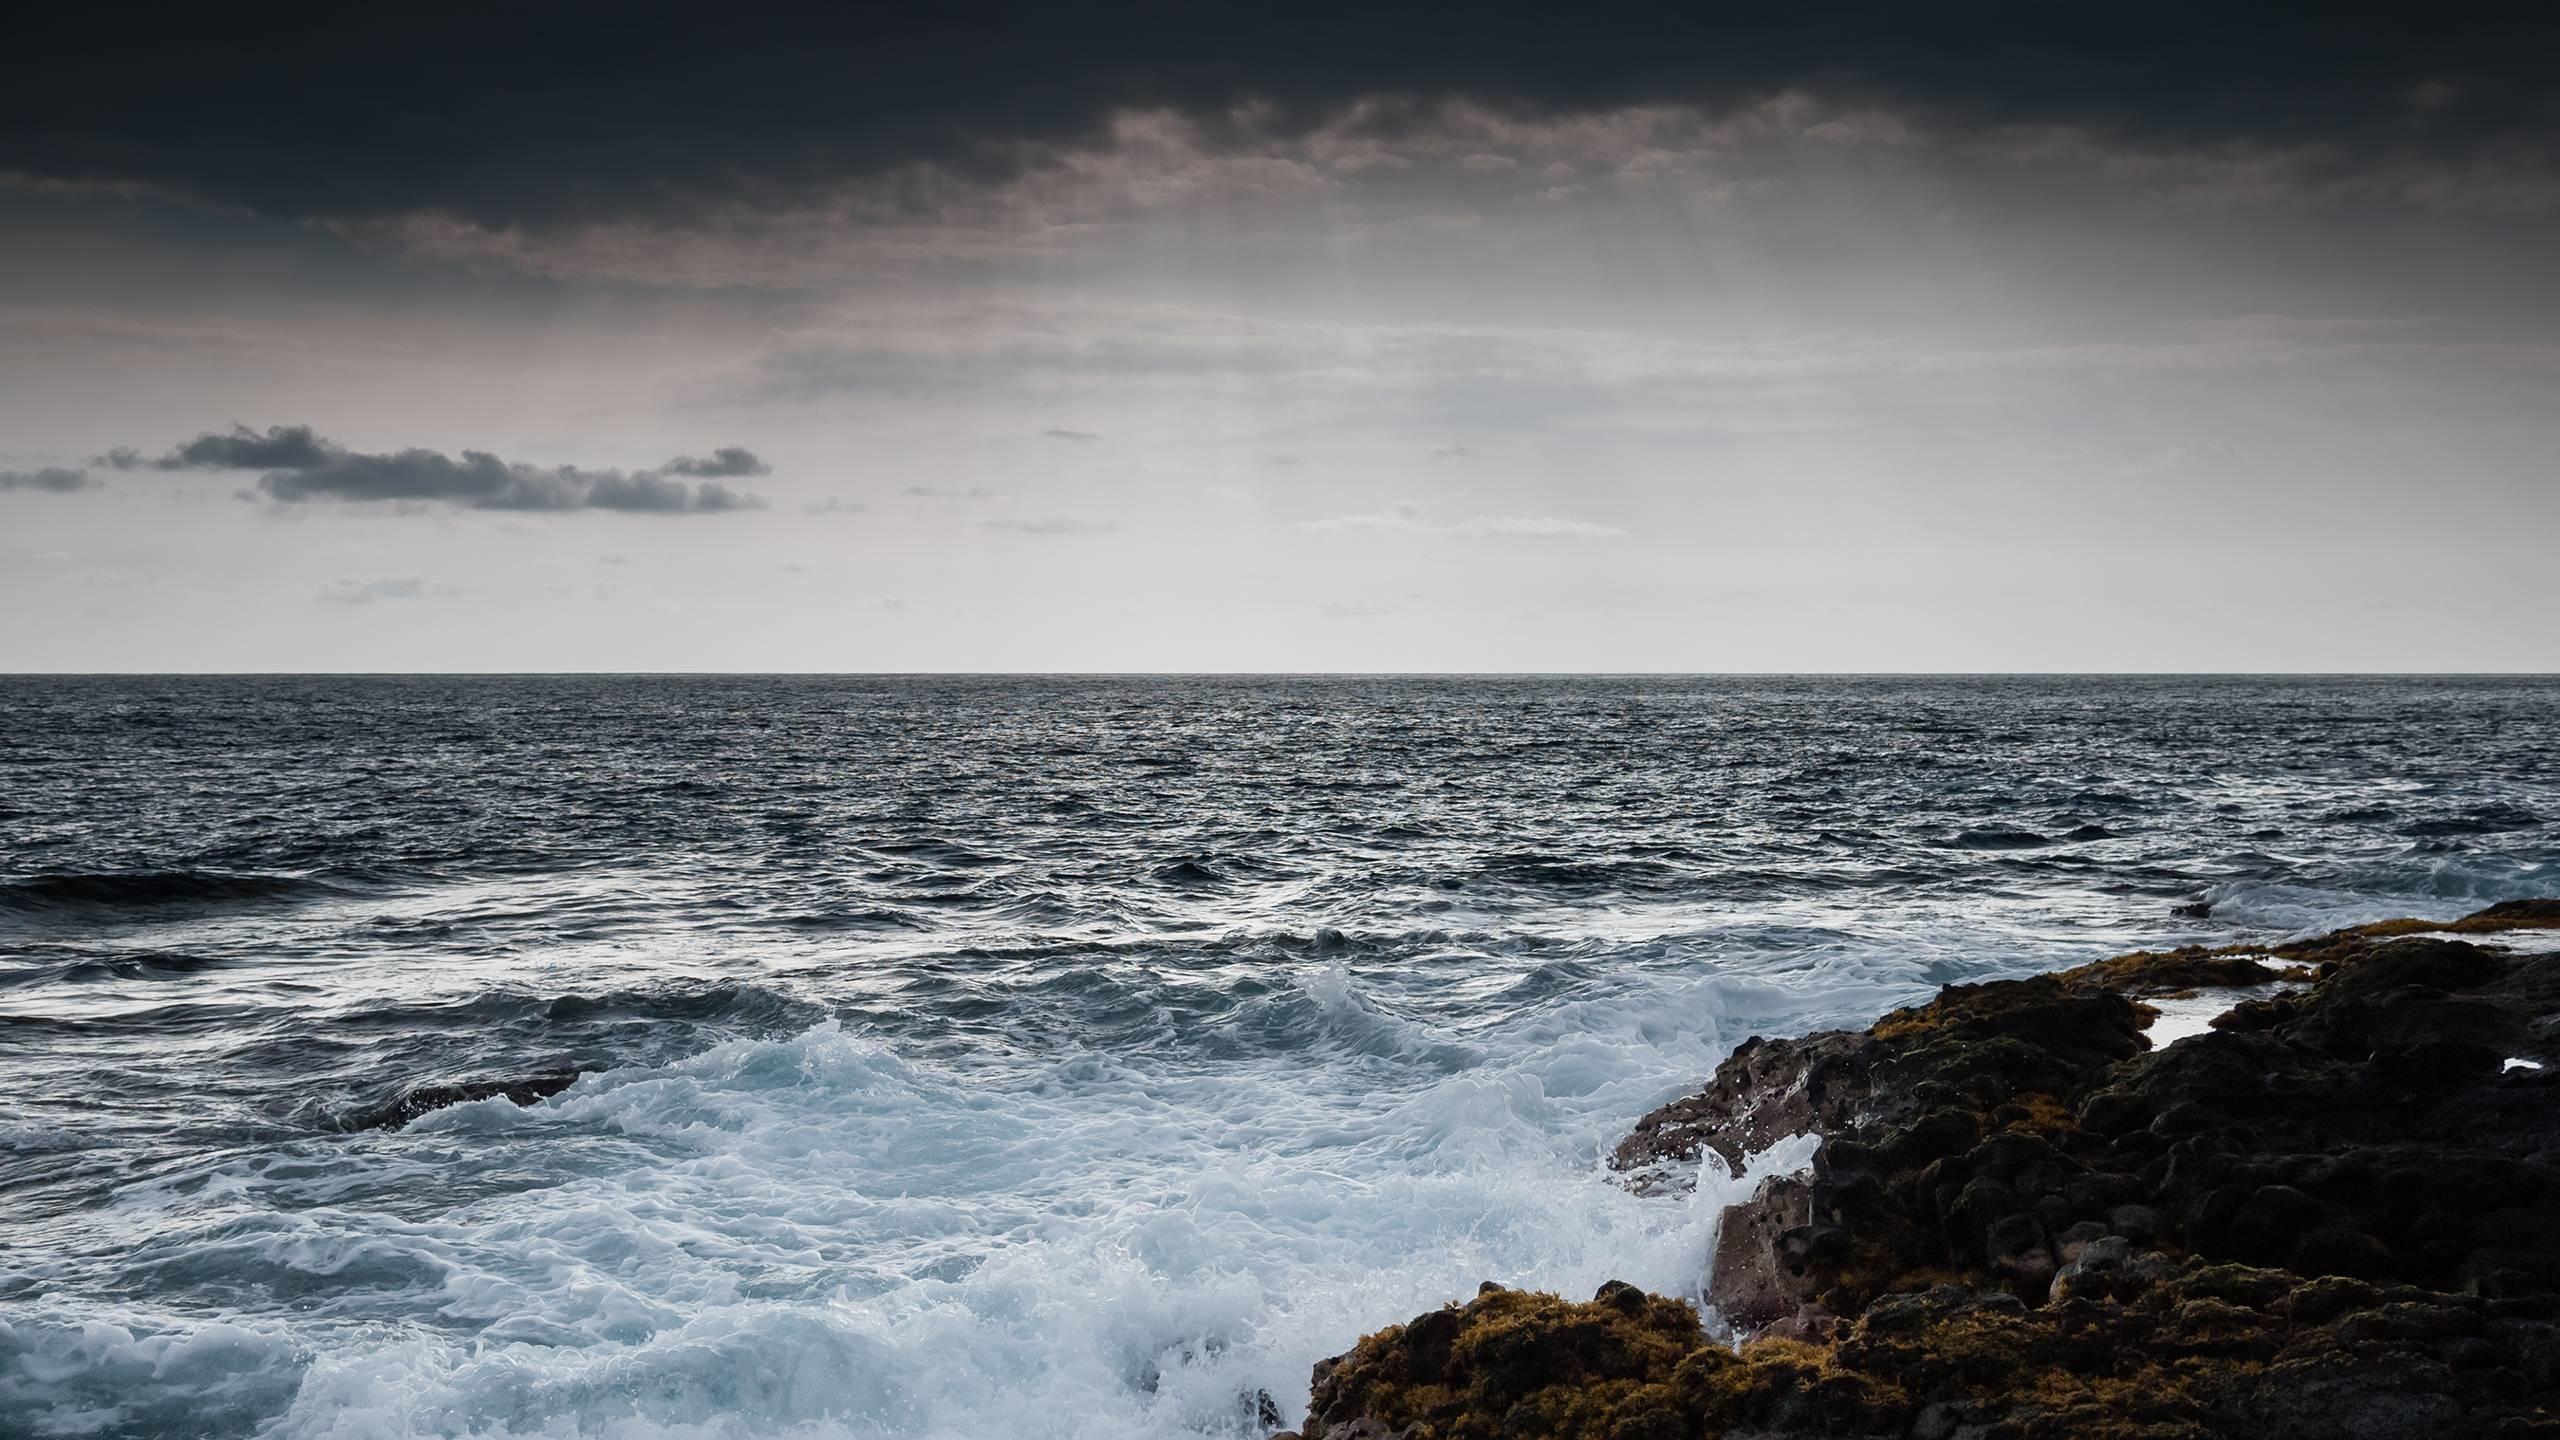 stormy-ocean-wallpaper1920_1080-by-joaomc12